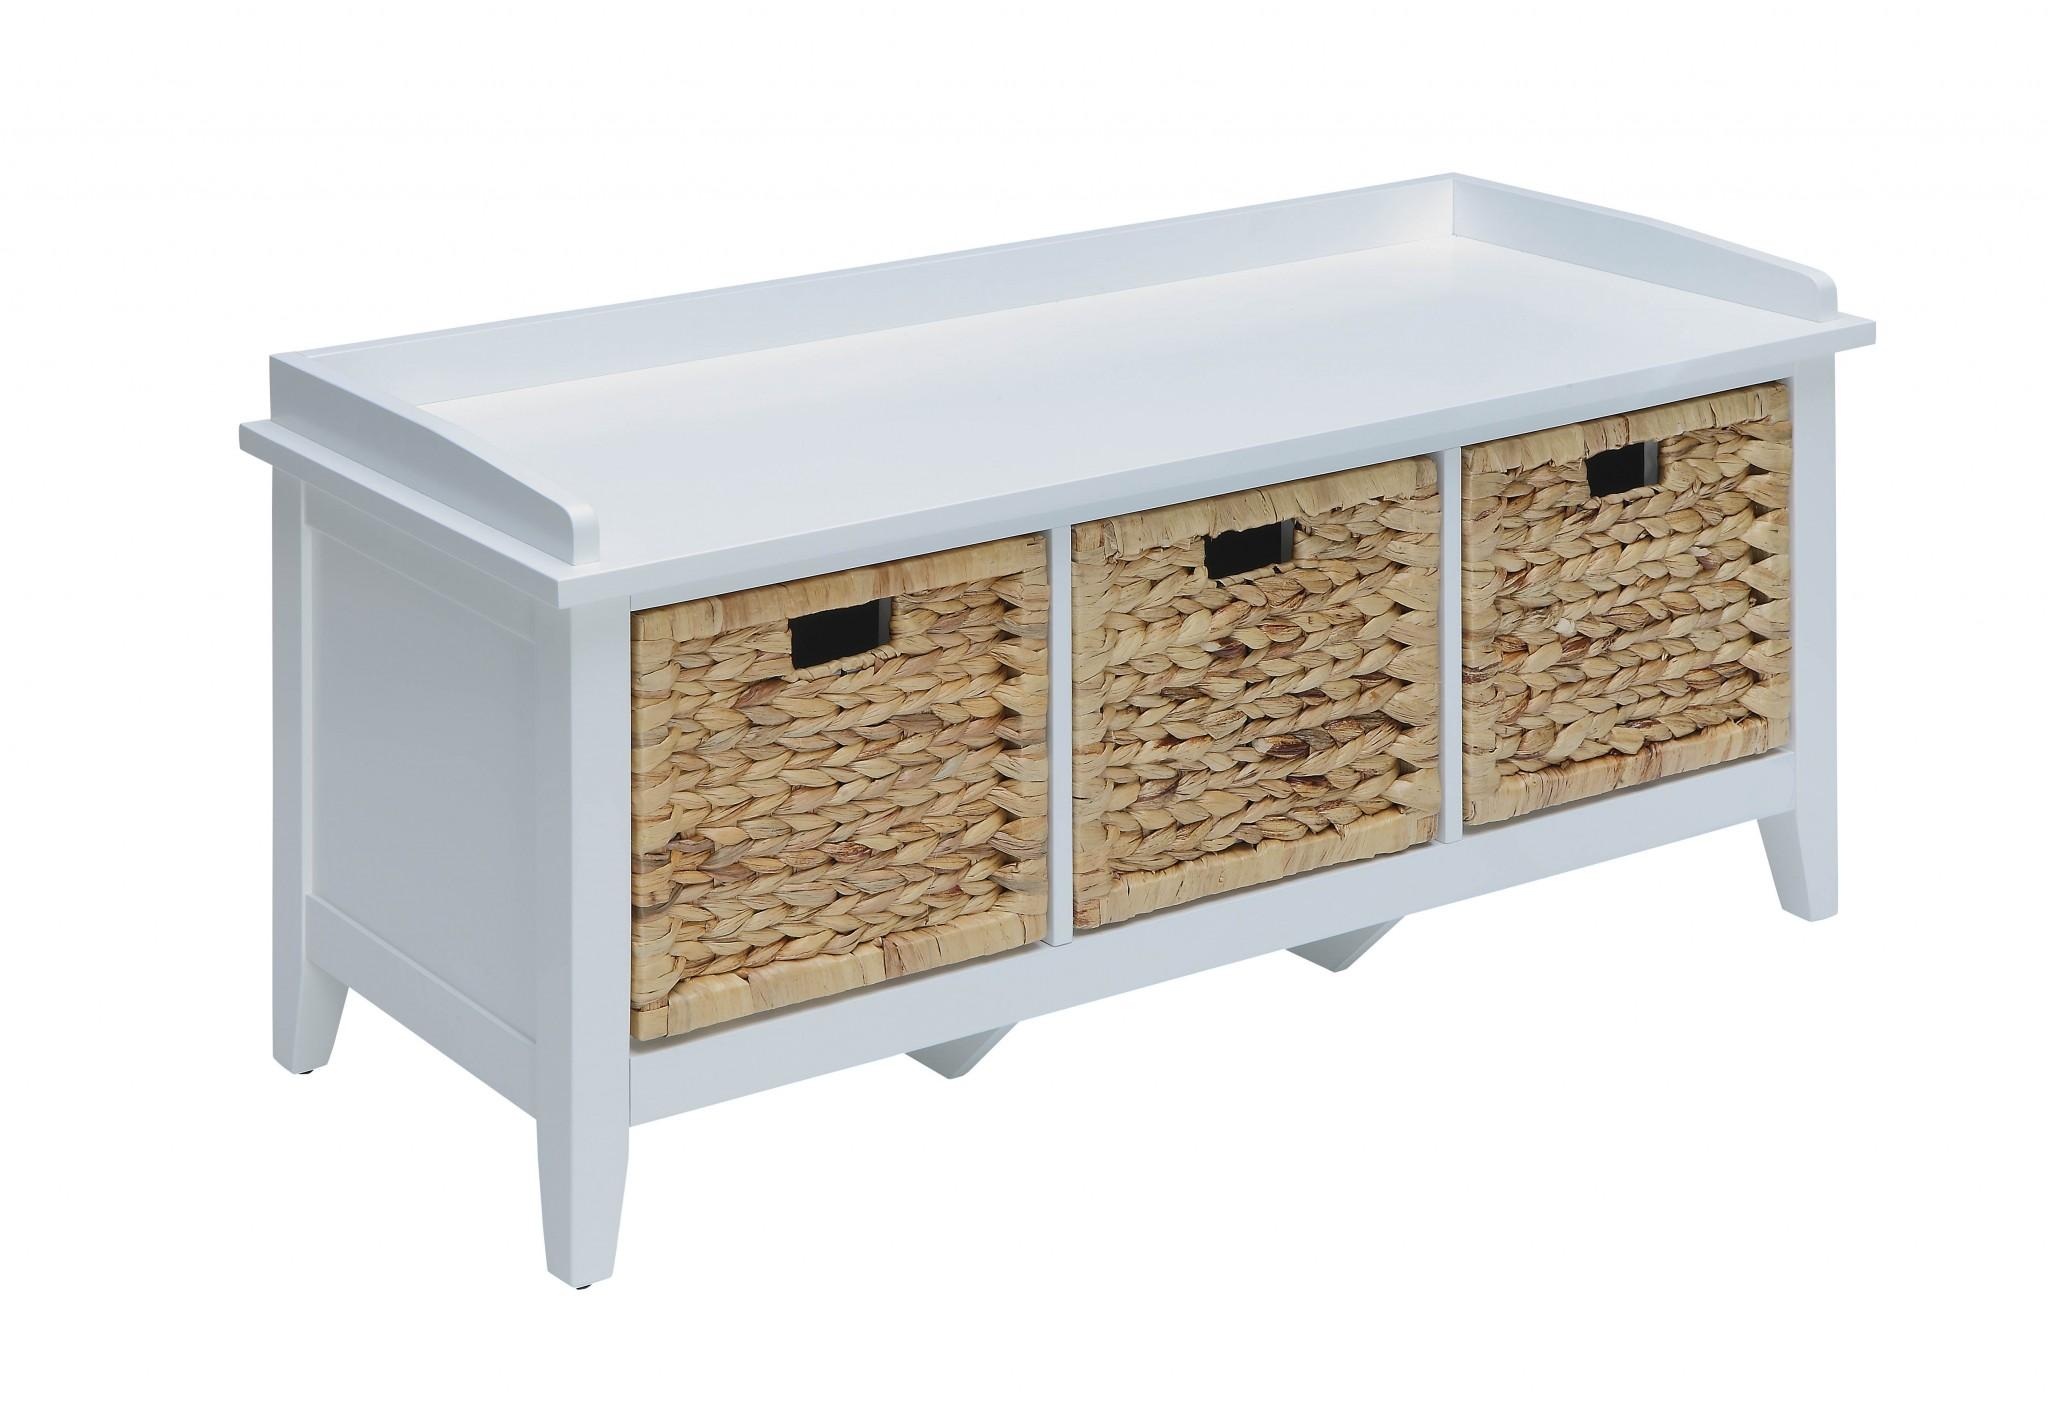 "43"" X 16"" X 19"" White Solid Wood Leg Storage Bench"